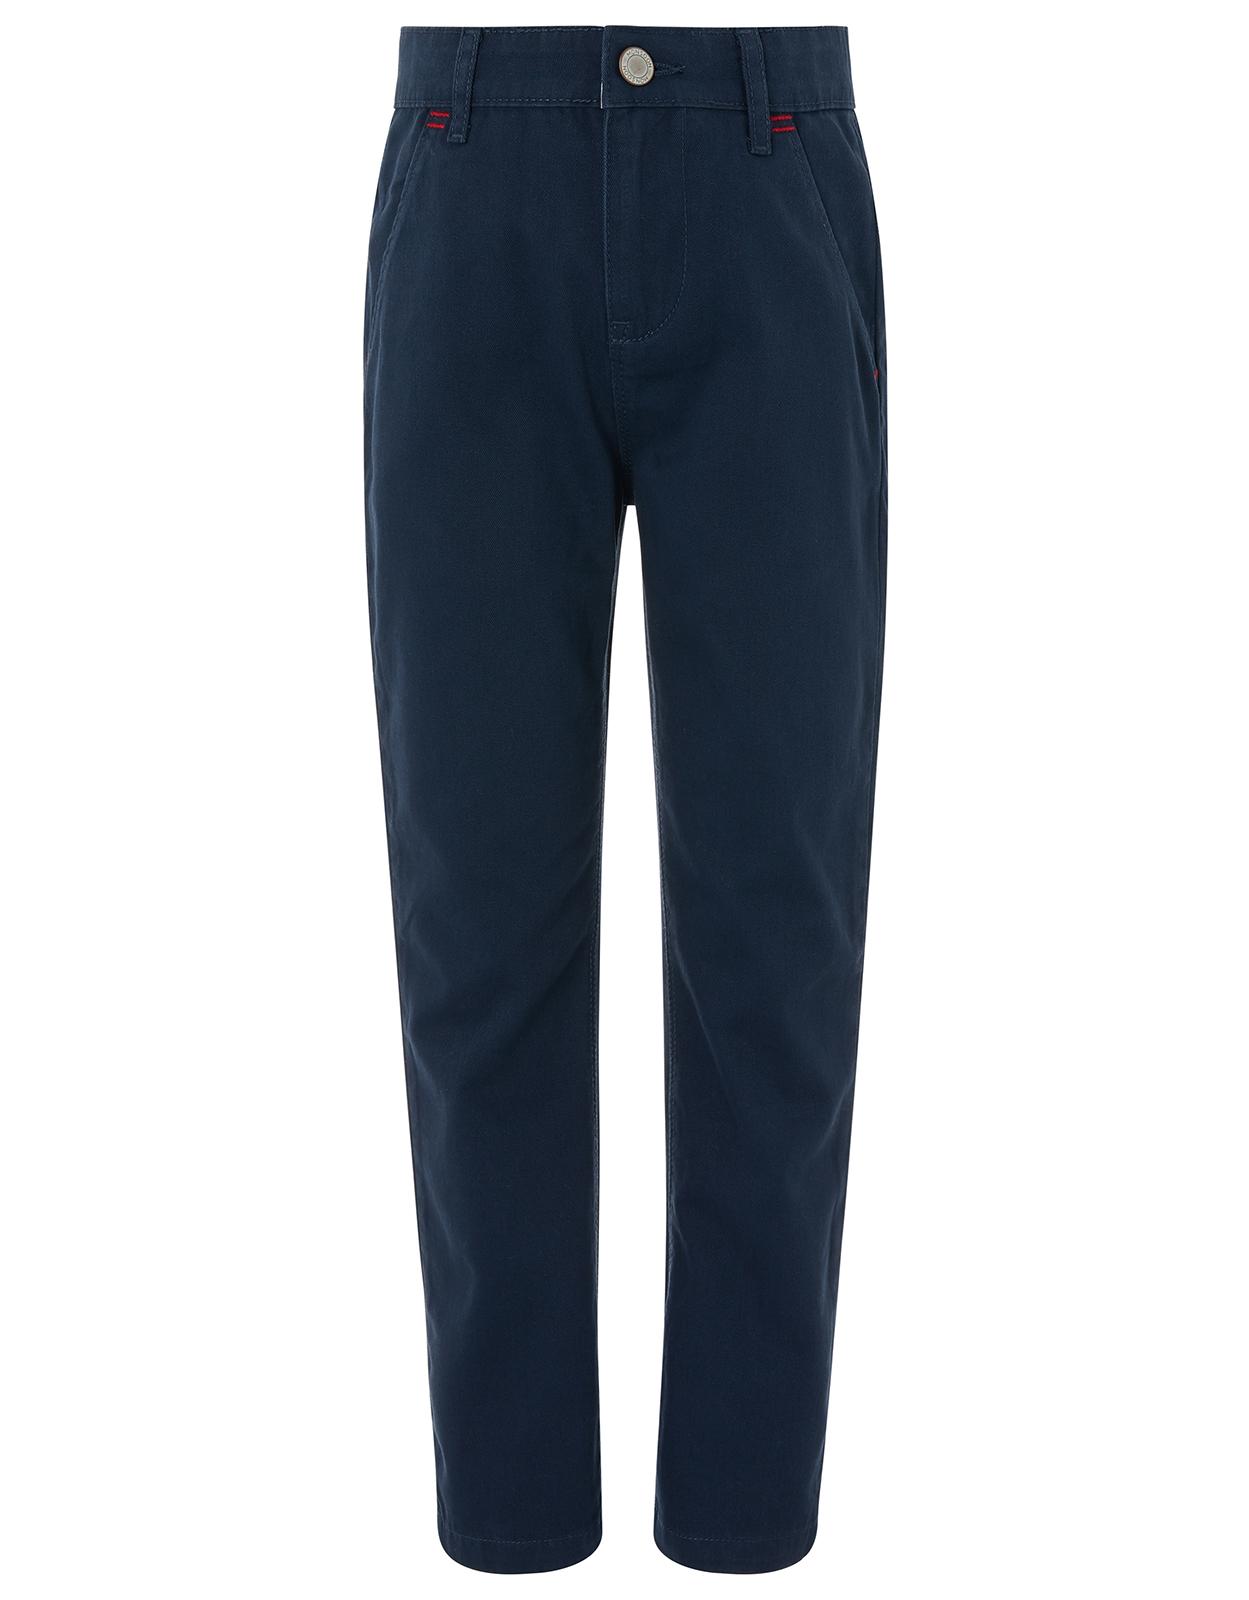 navy-chino-trousers